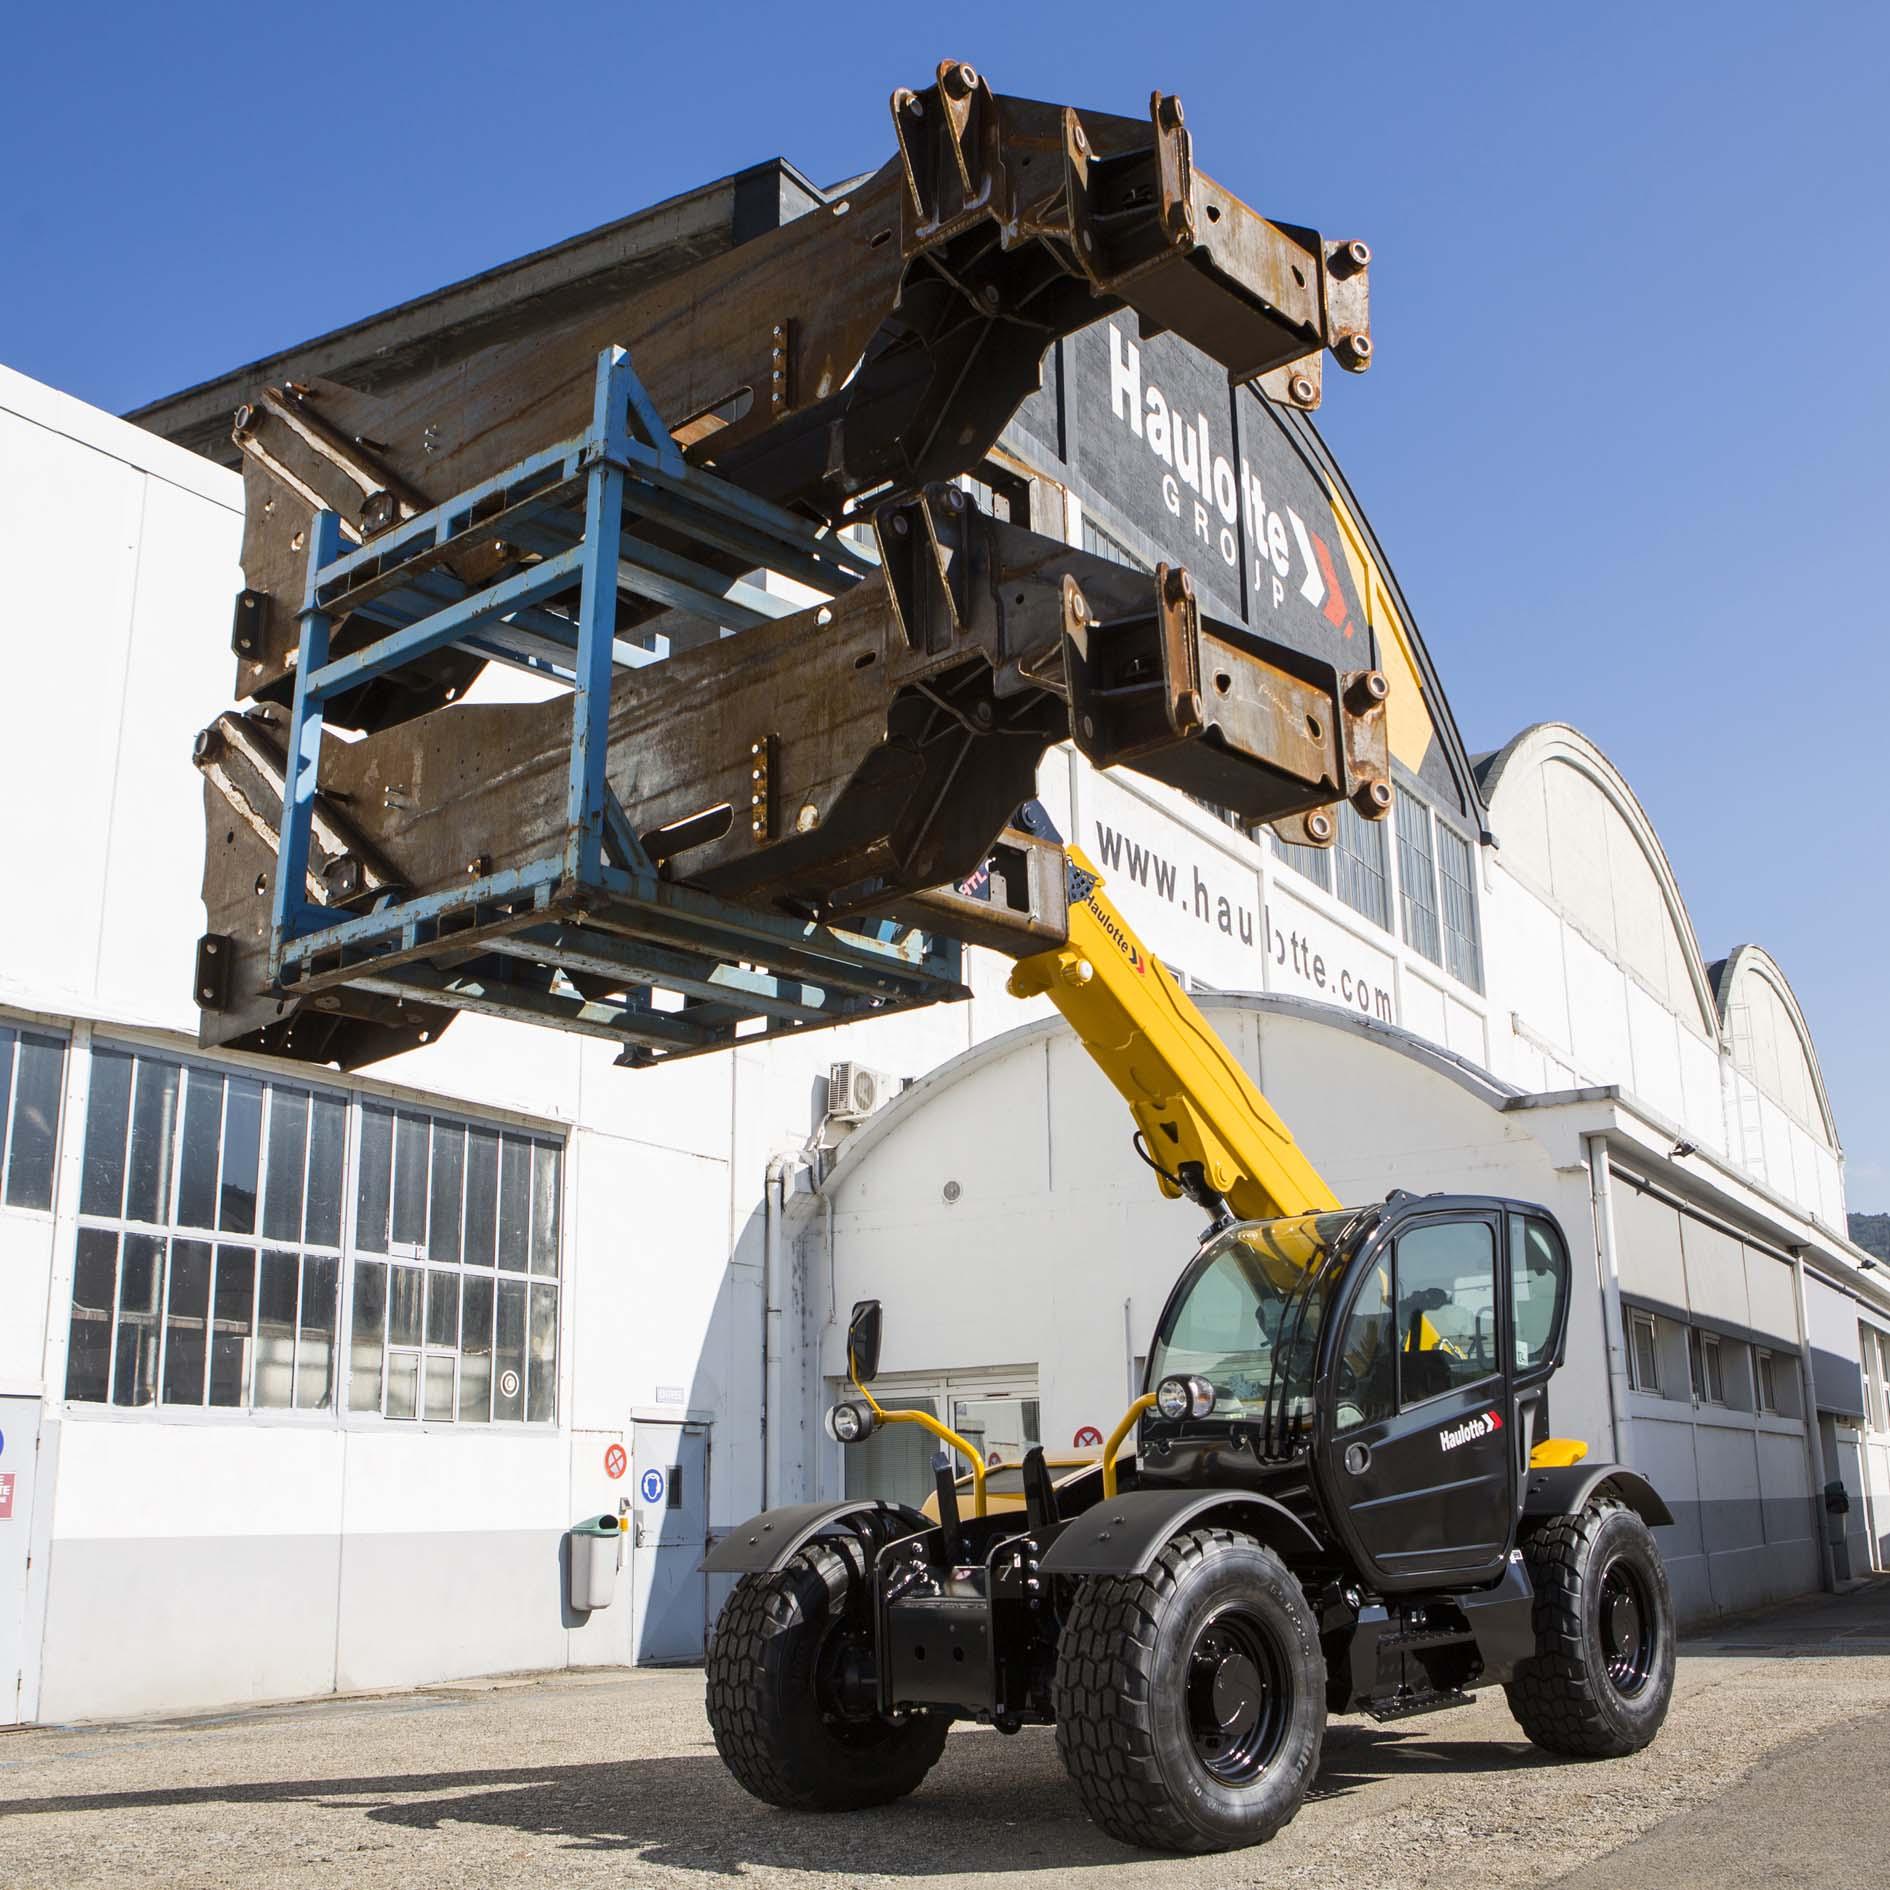 Haulotte i nuovi sollevatori pesanti -  -In quota Notizie Sollevatori telescopici - MC5.0-Macchine Cantieri 5